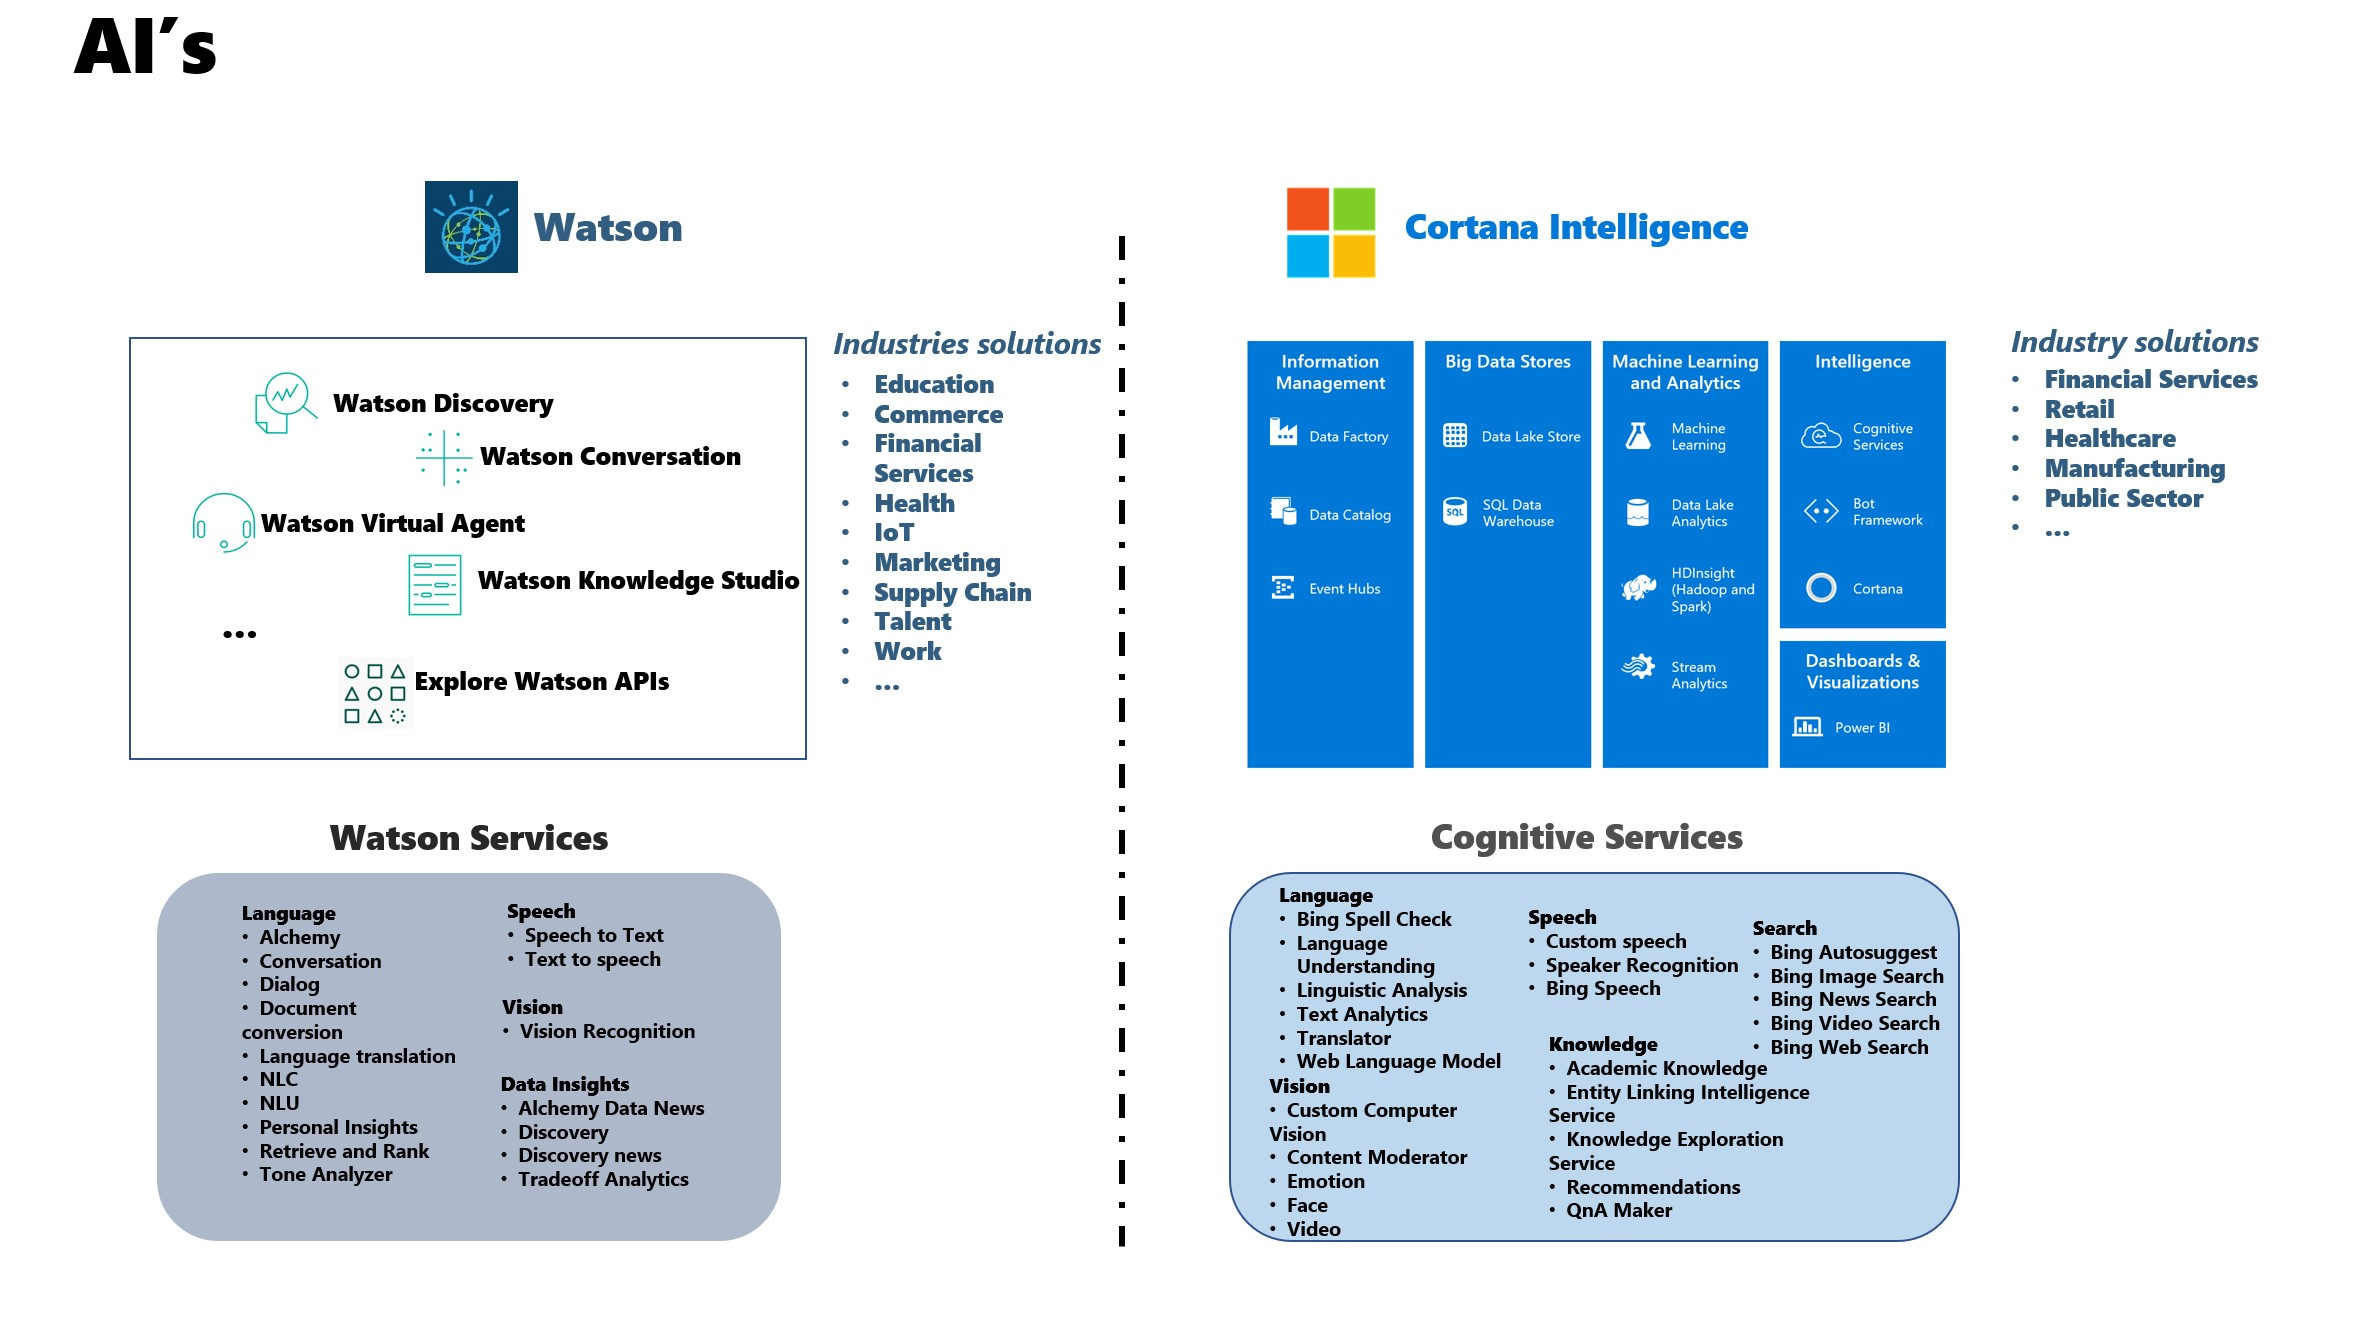 IBM Watson vs Microsoft Cortana Intelligence suite